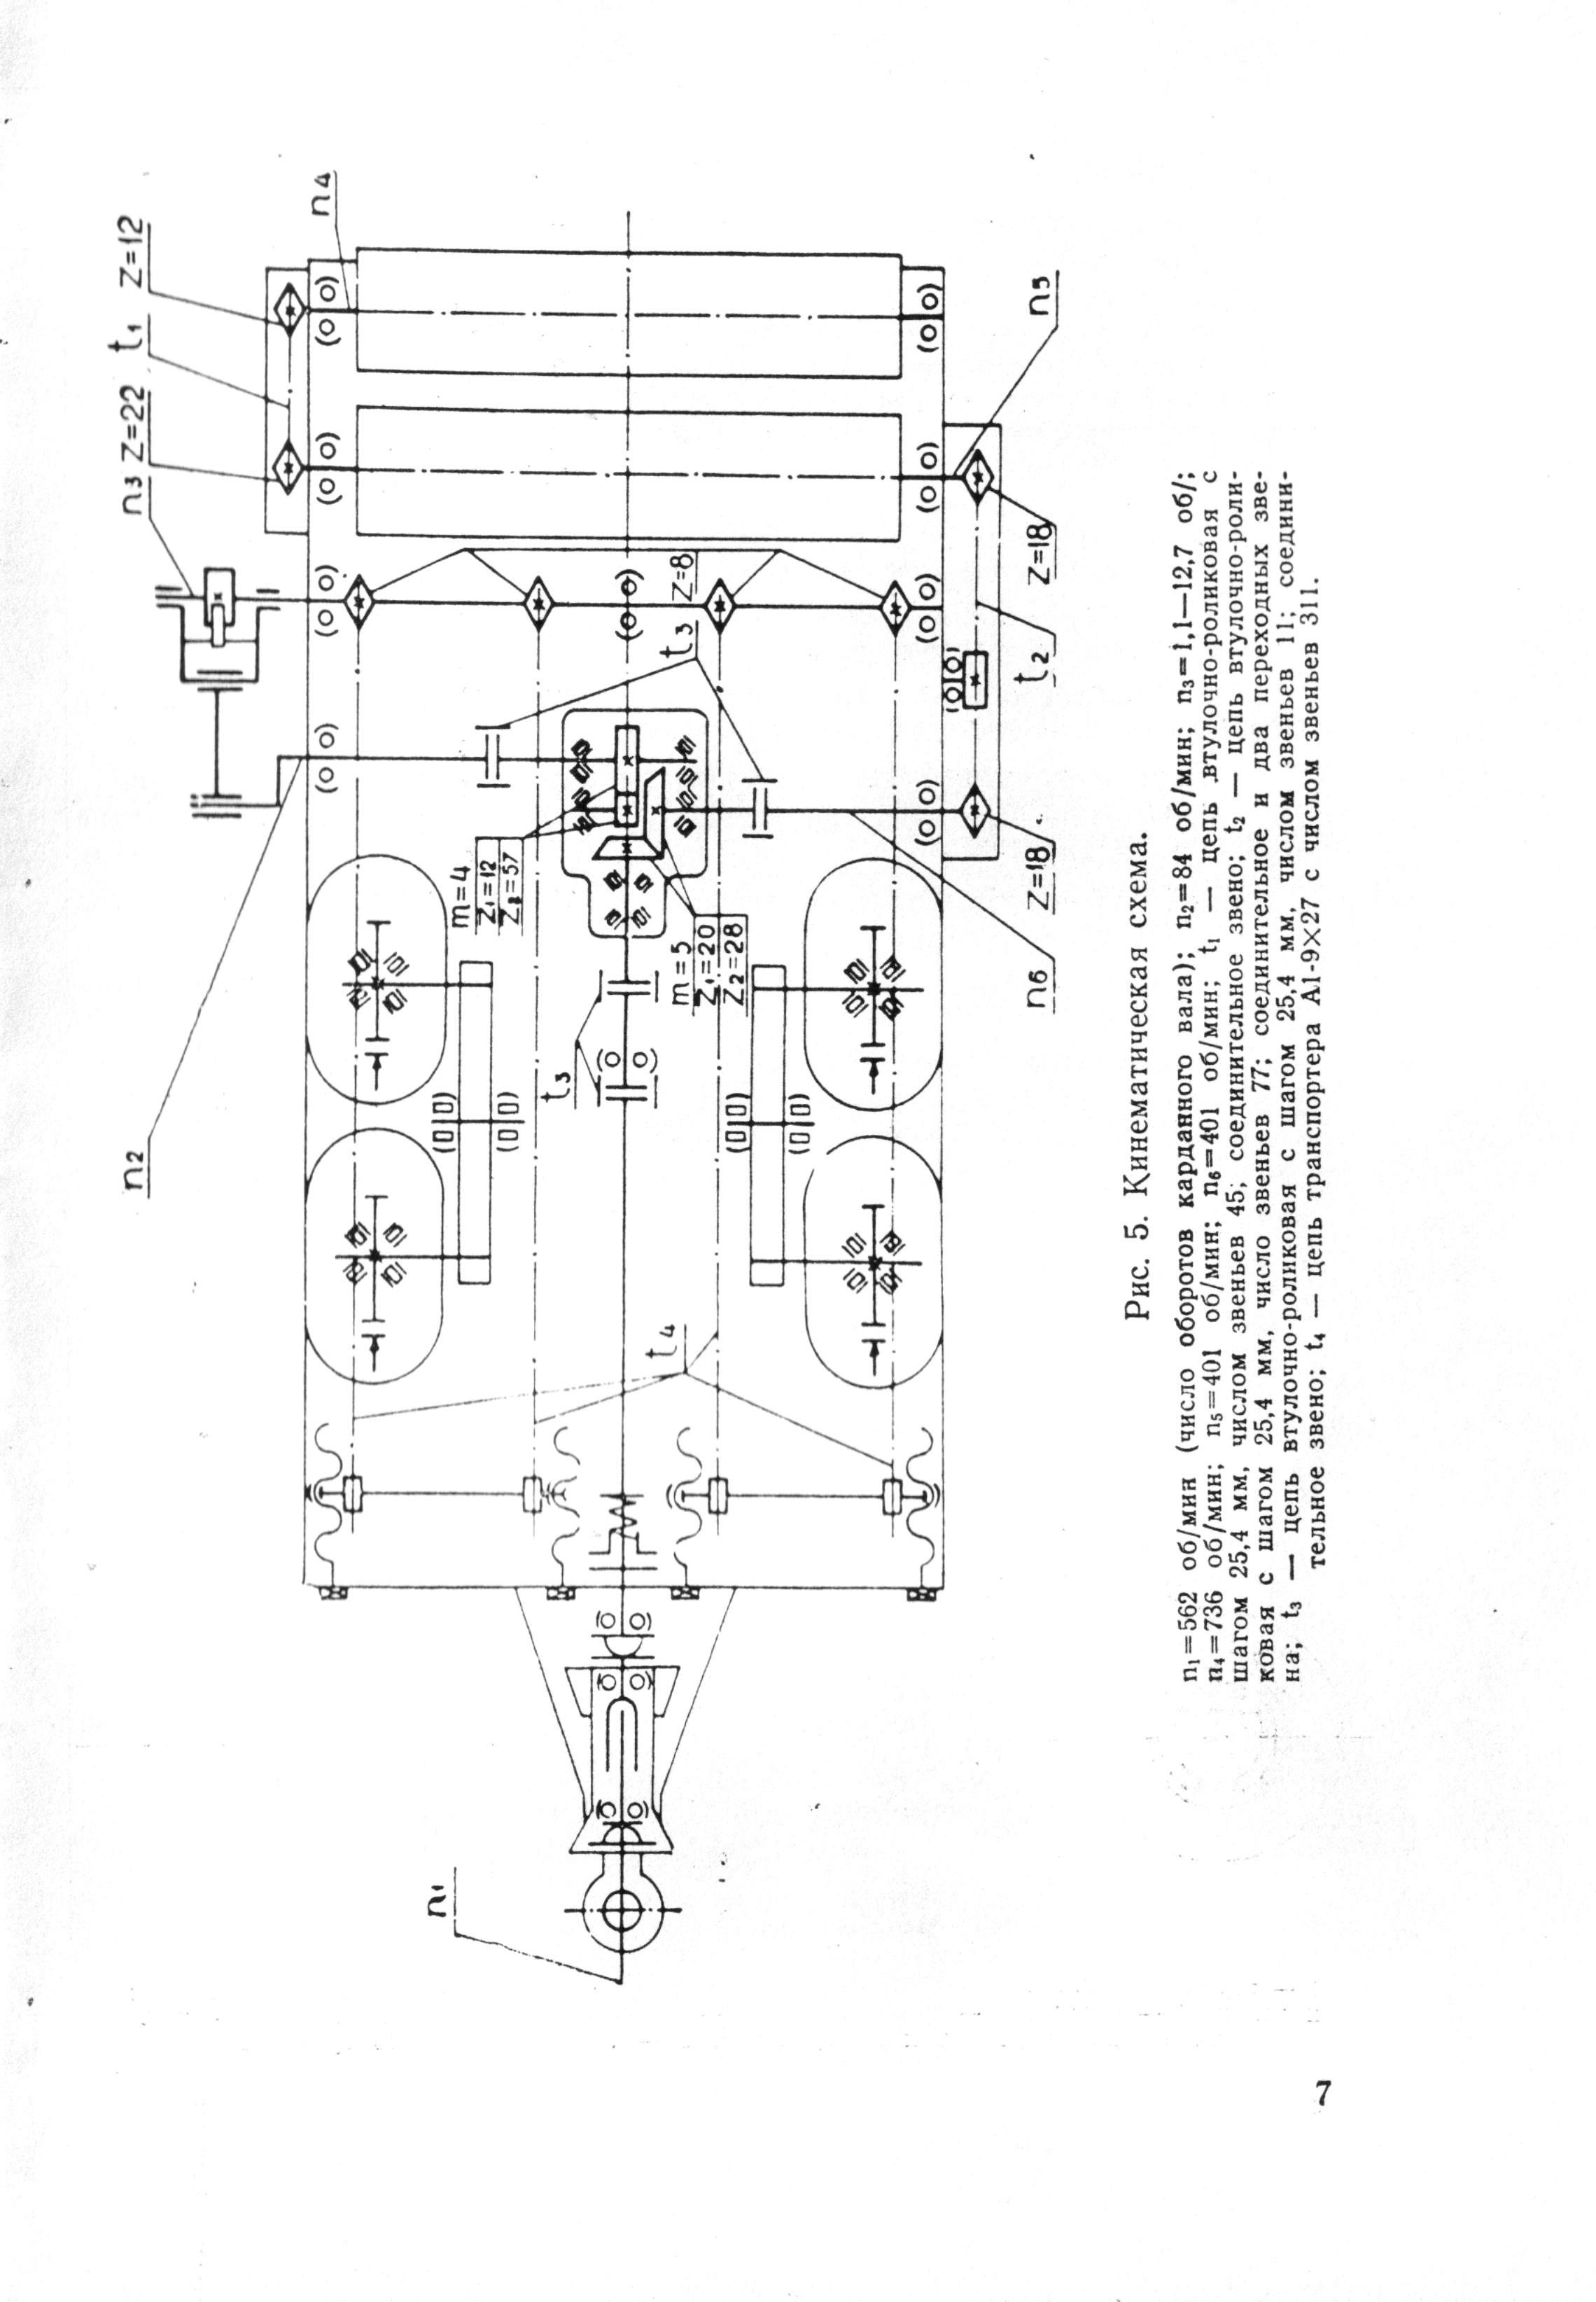 Ремонт транспортера роу 6 i каталог фольксваген транспортер т4